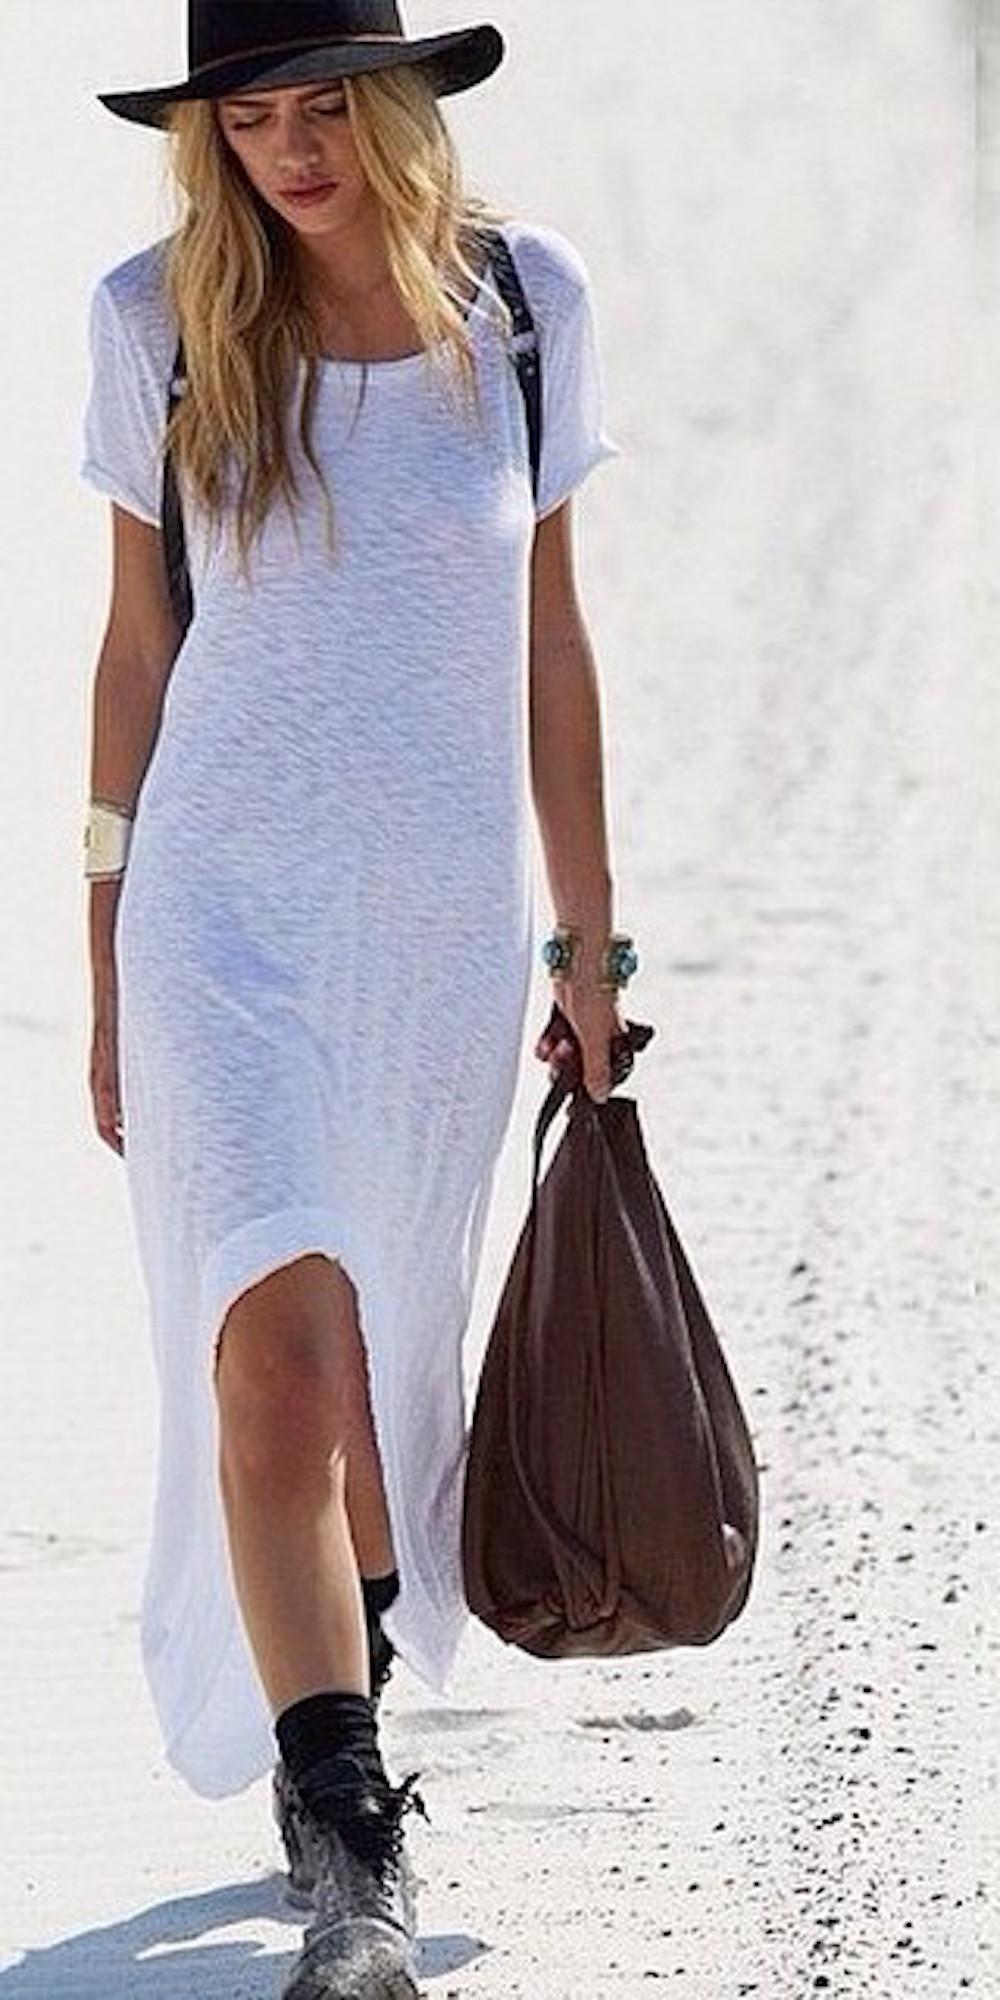 SLUB HIGH LOW TUNIC DRESSES IN 2 COLORS AT WWW.SHOPPUBLIK.COM